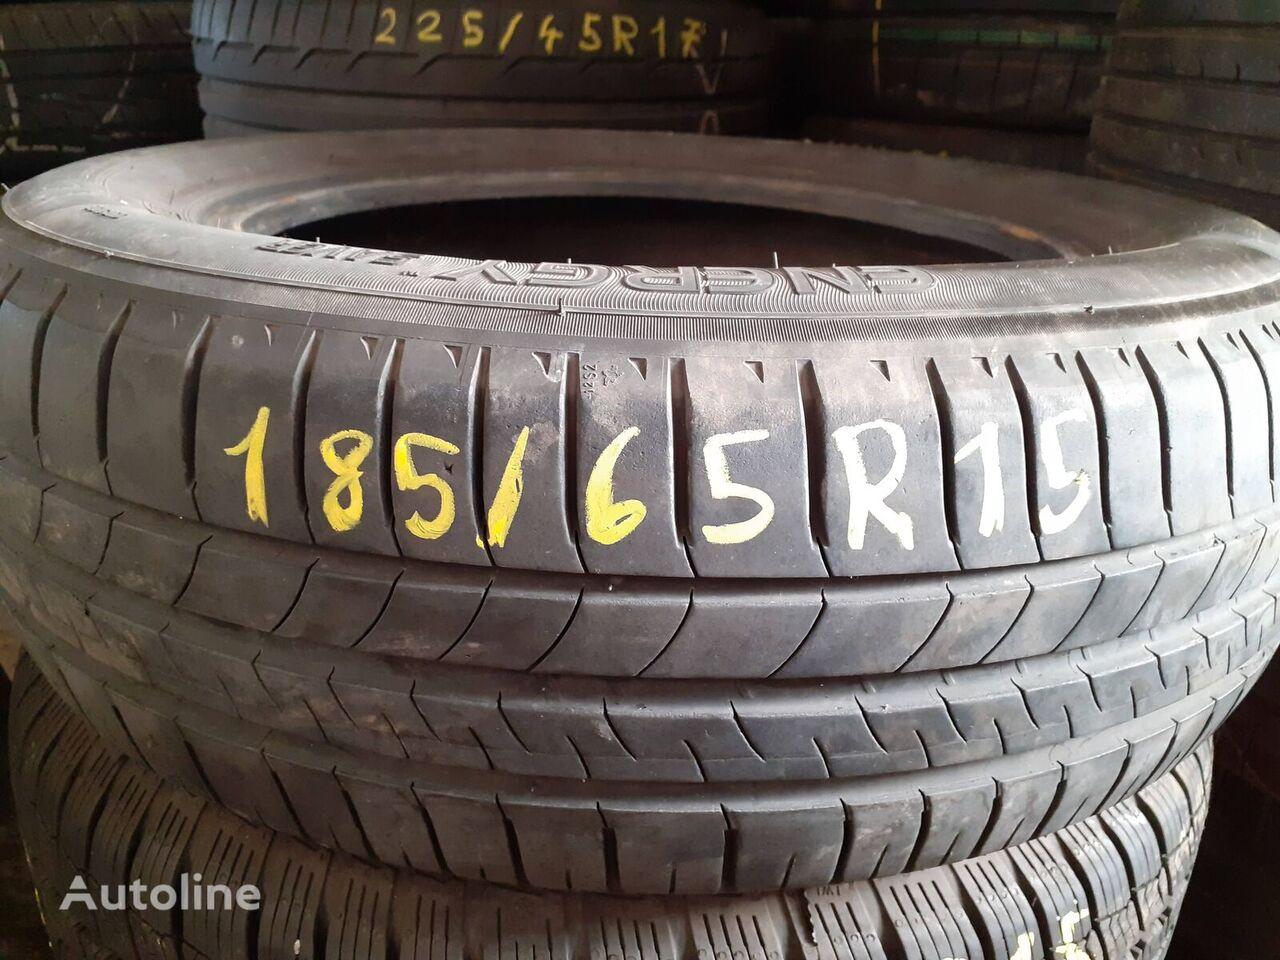 Michelin 185/65 R 15.00 car tire